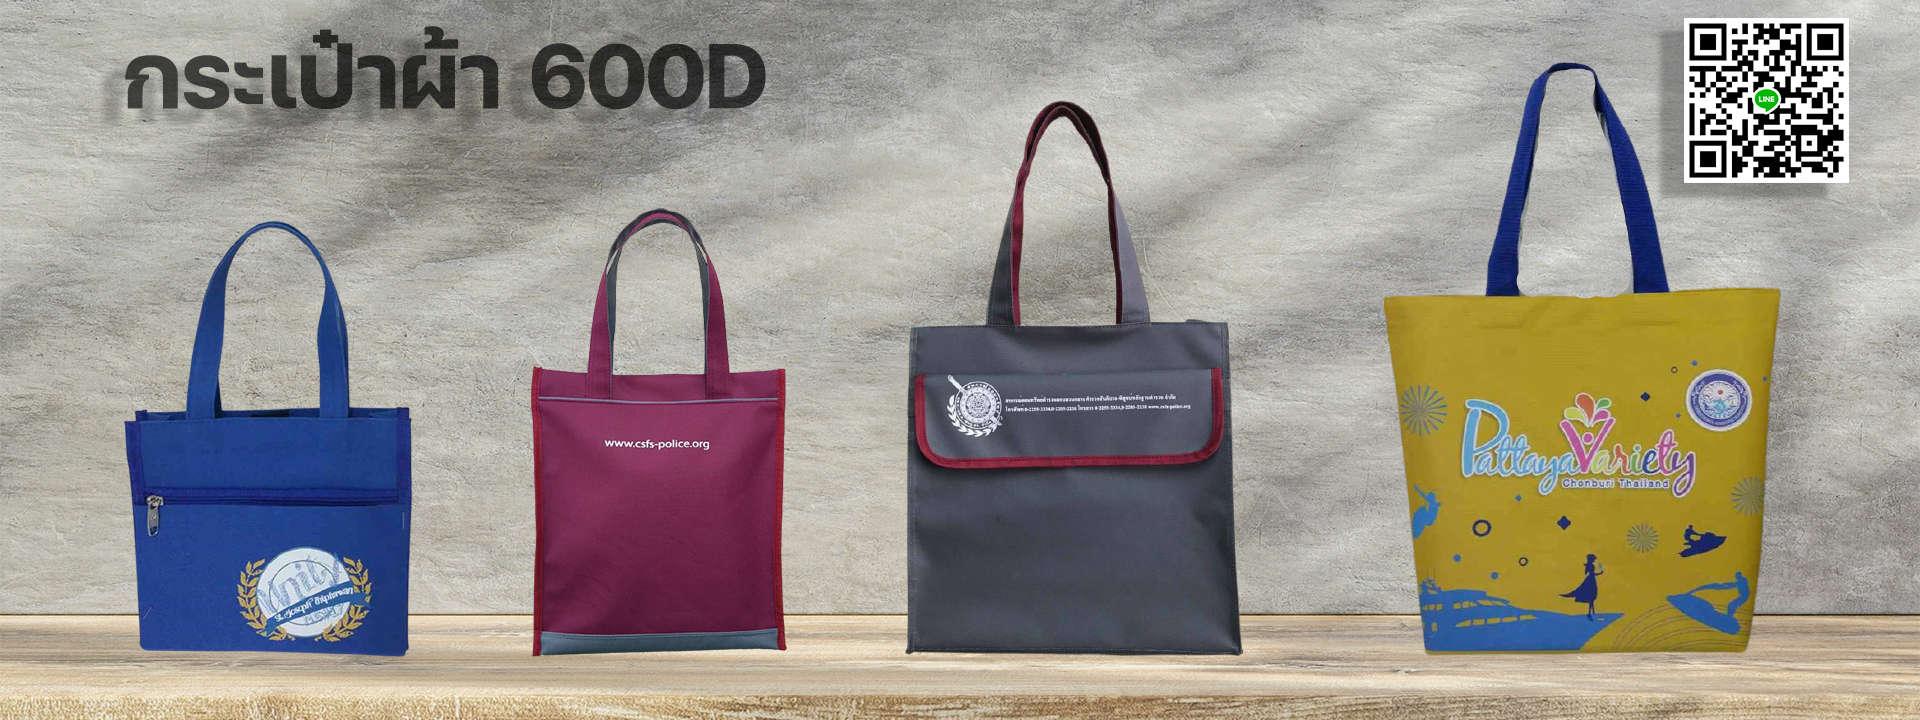 Villingmind Premium รับผลิตกระเป๋าผ้า 600D